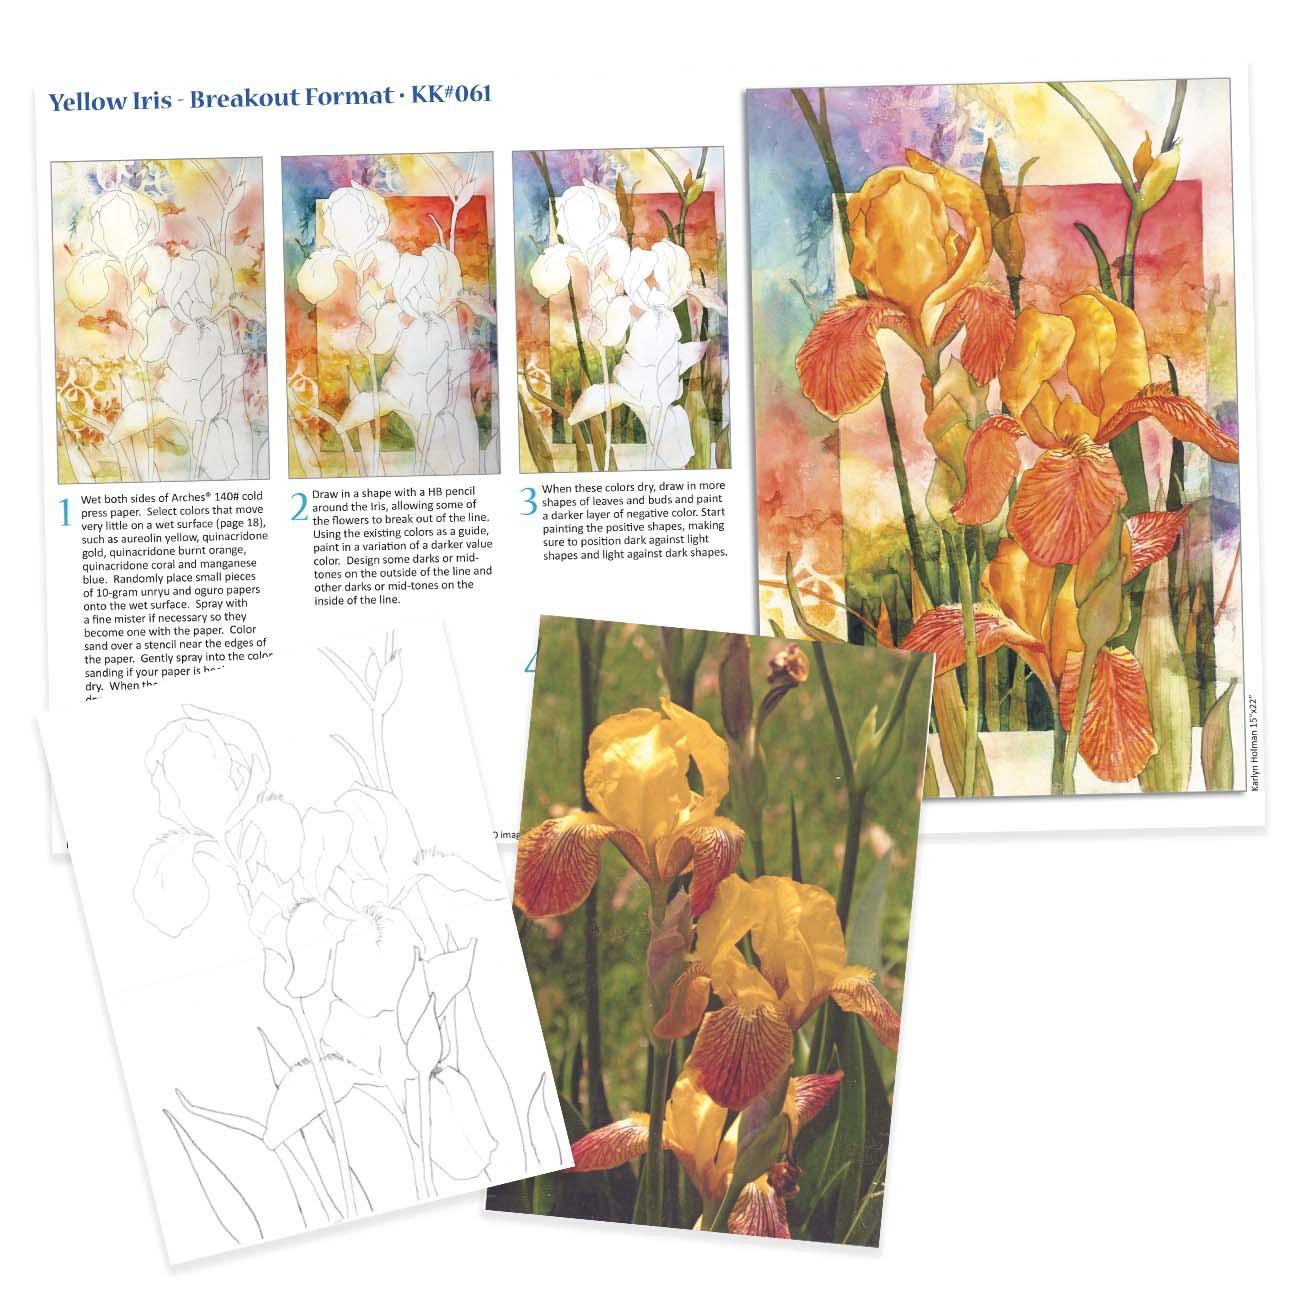 KK061 - Yellow Iris, Breakout Format